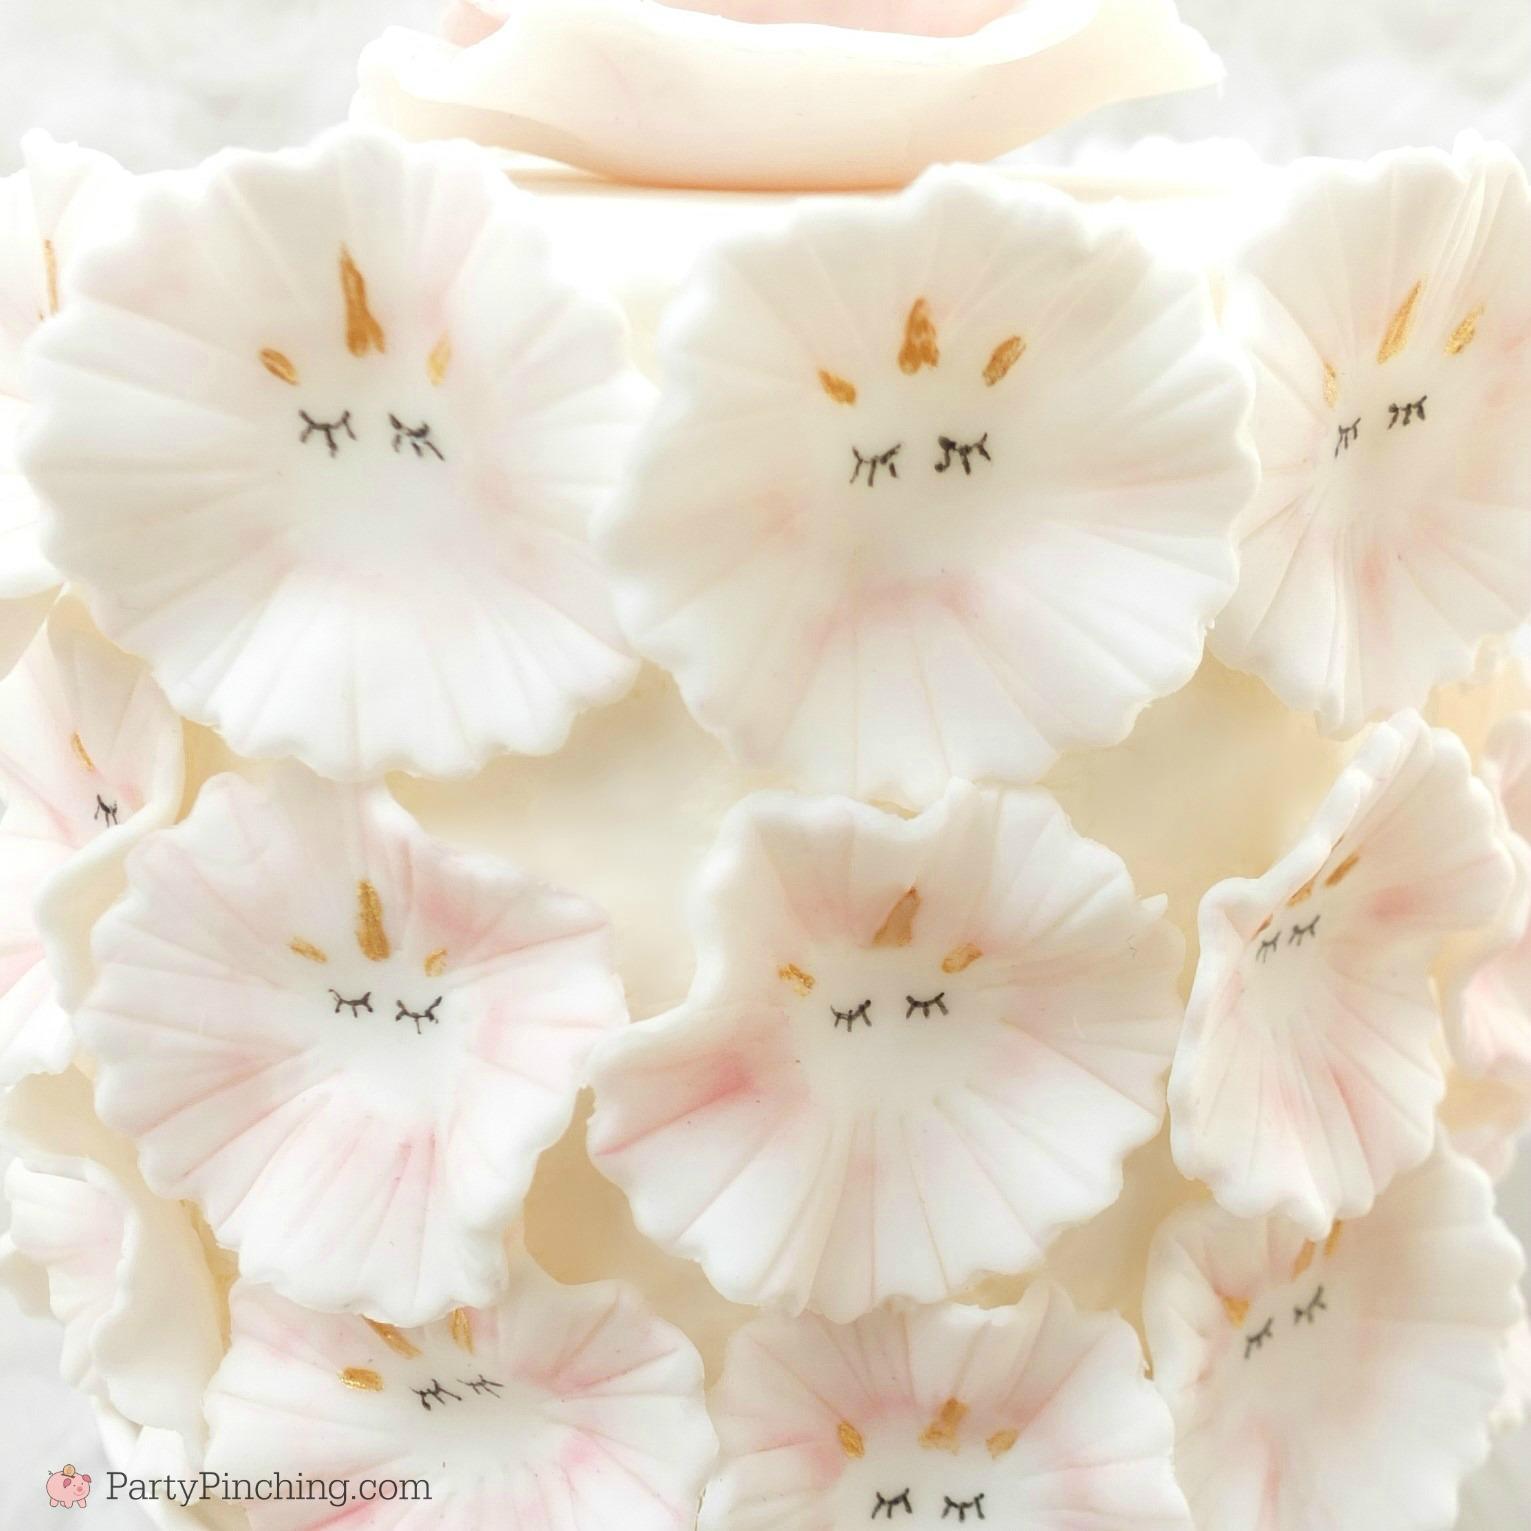 fondant unicorn cake, ruffle unicorn cake, flower unicorn cake, pretty unicorn cake, beautiful gorgeous unicorn cake, pink and white unicorn cake, fluffy flower petal unicorn cake pink white